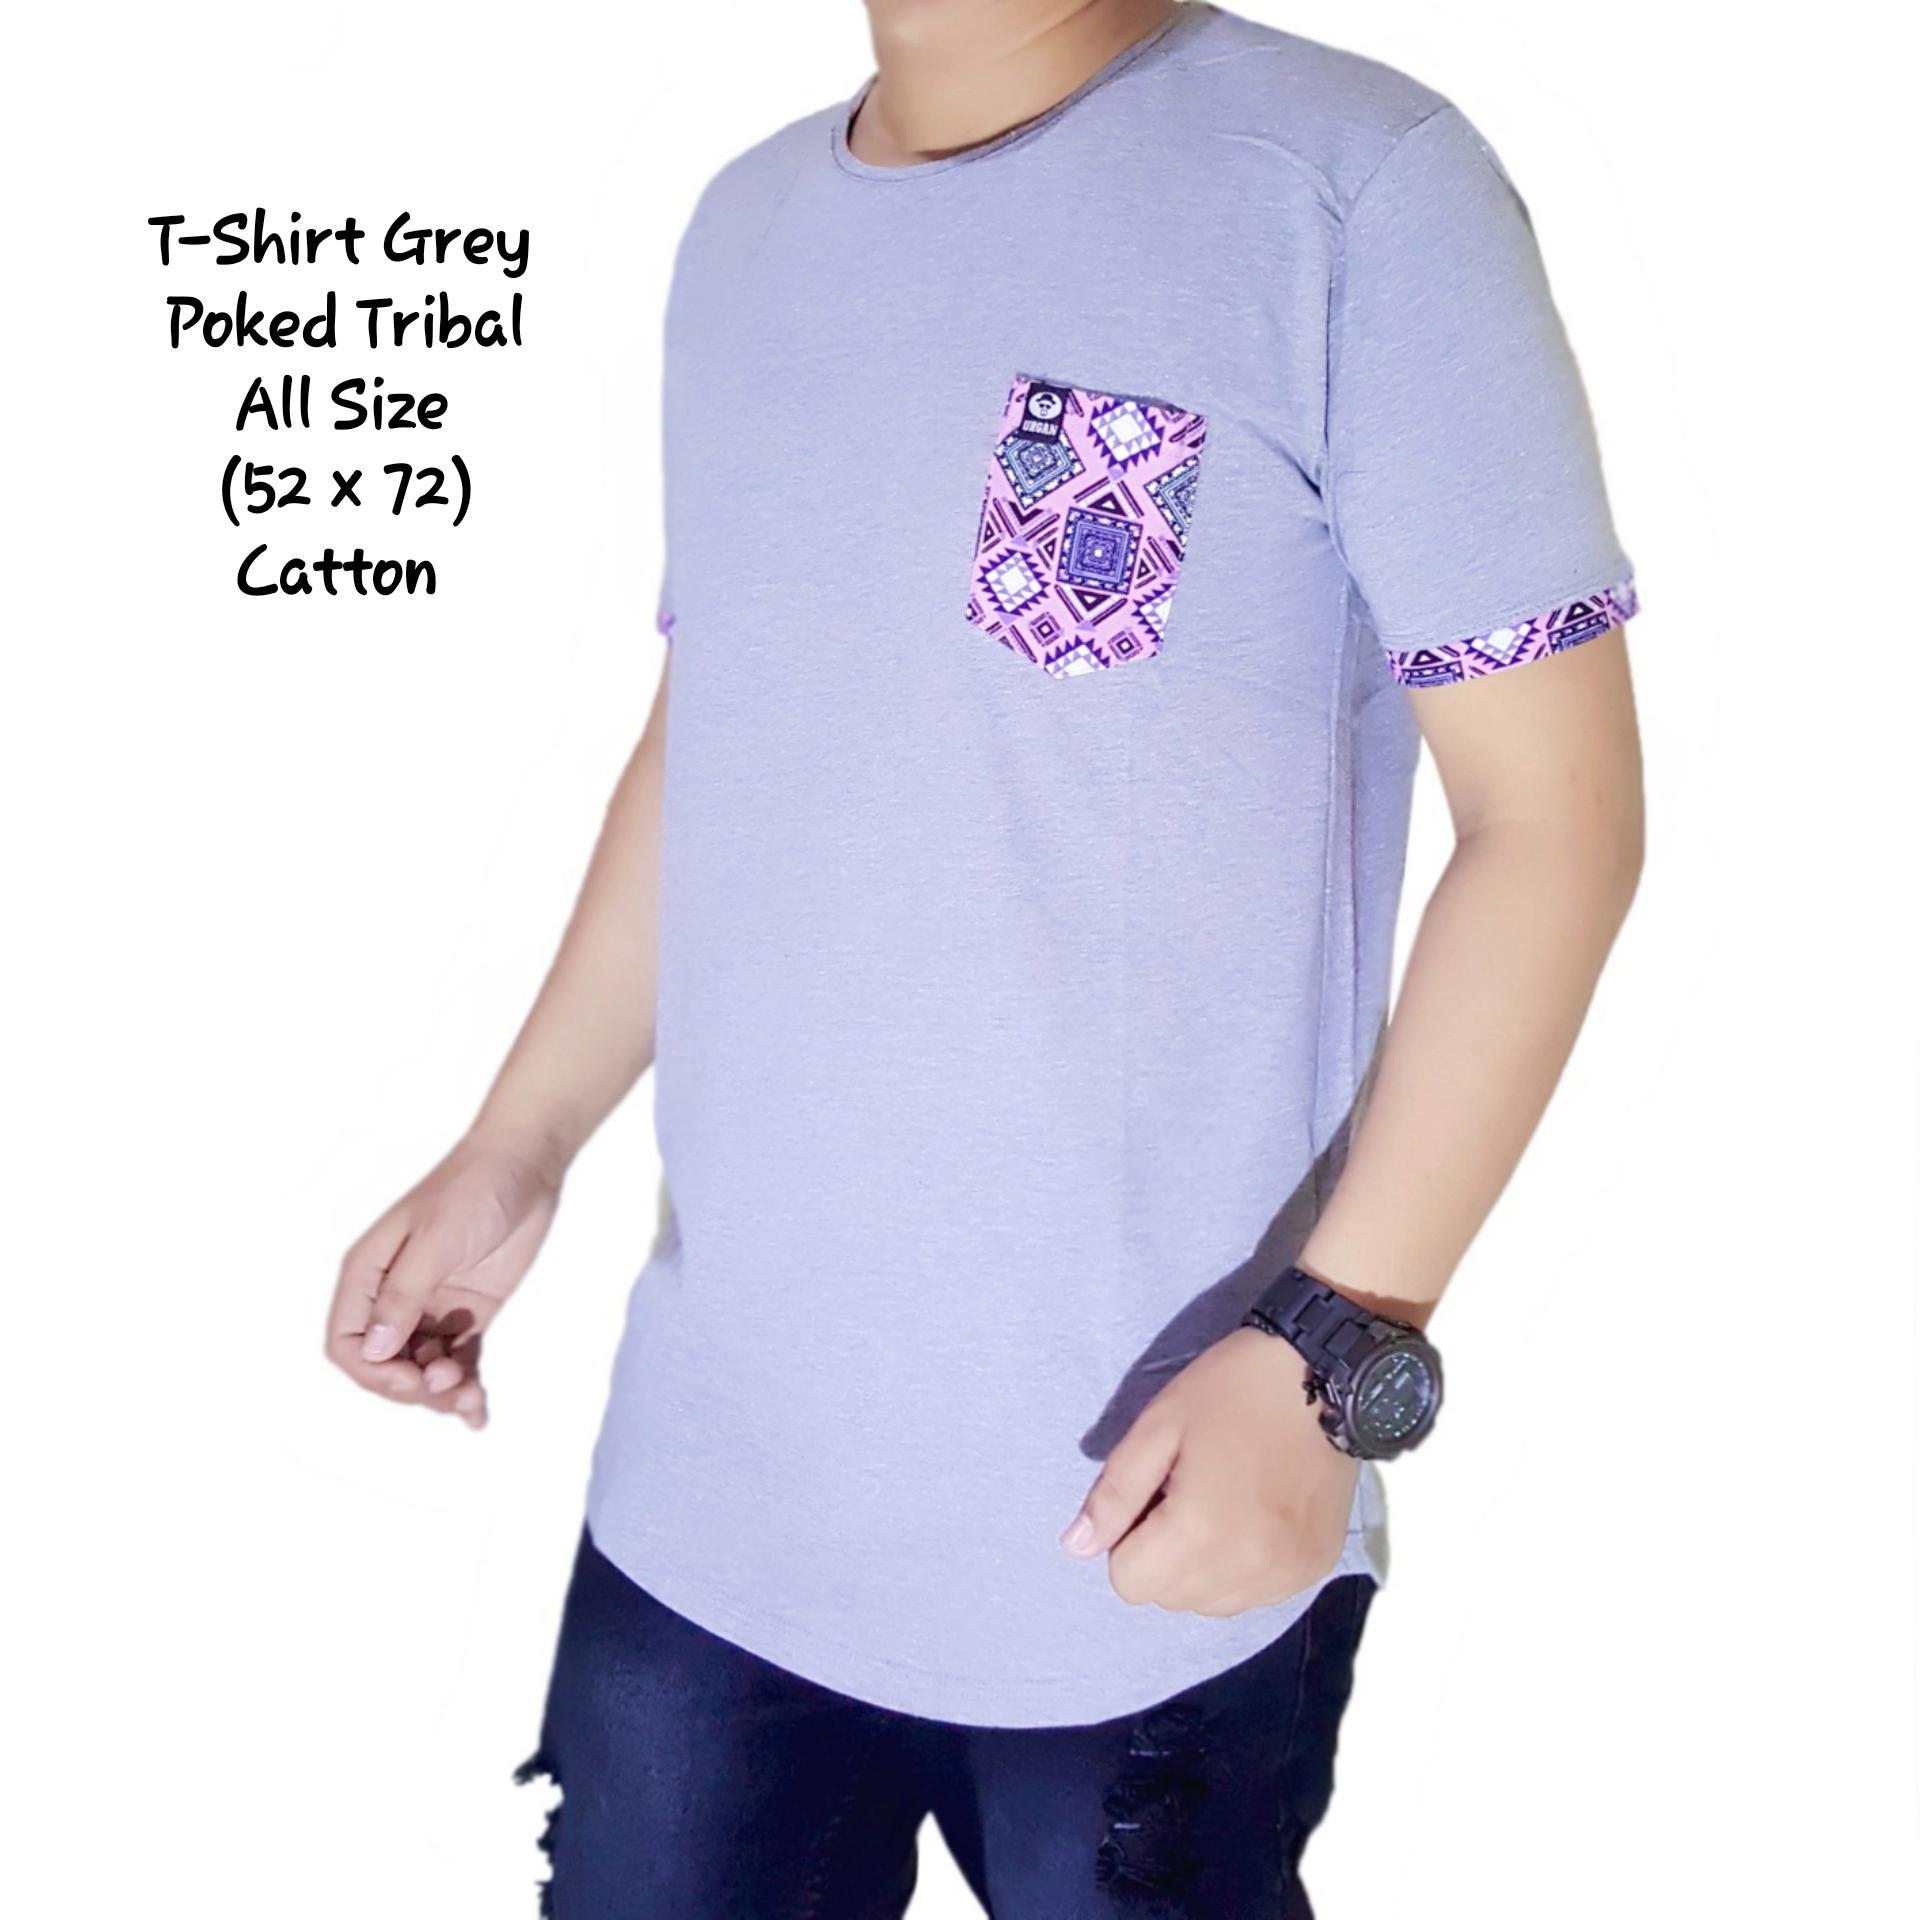 ... Baju Pakaian Polos Pria Wanita Cewe Cowo Lengan ... Source · Anugrah – kaos distro T-shirt Fashion 100% soft cotton combed